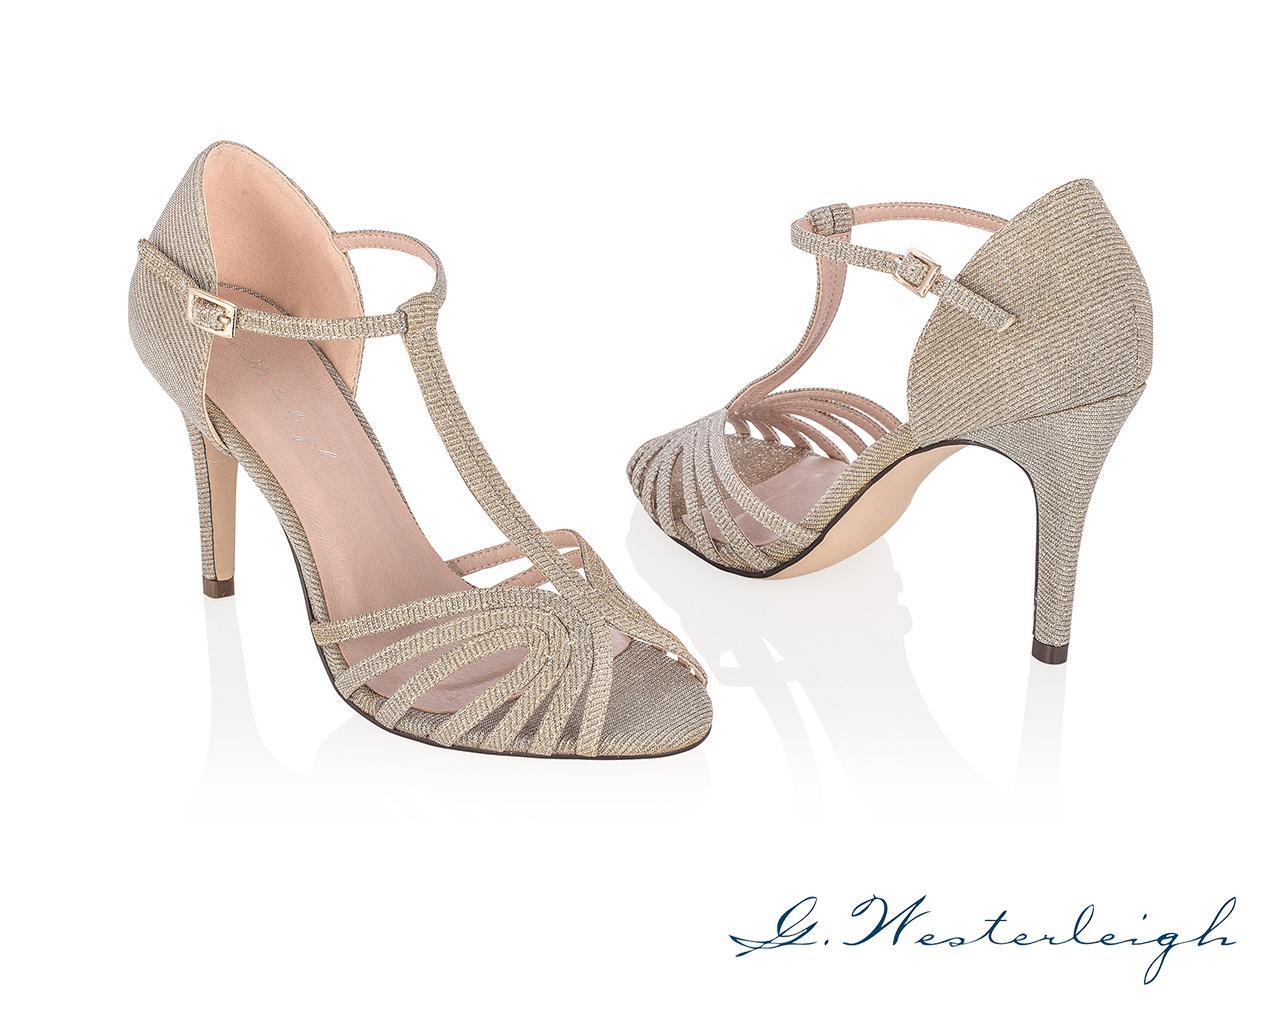 Spoločenské topánky Marbella - Obrázok č. 1